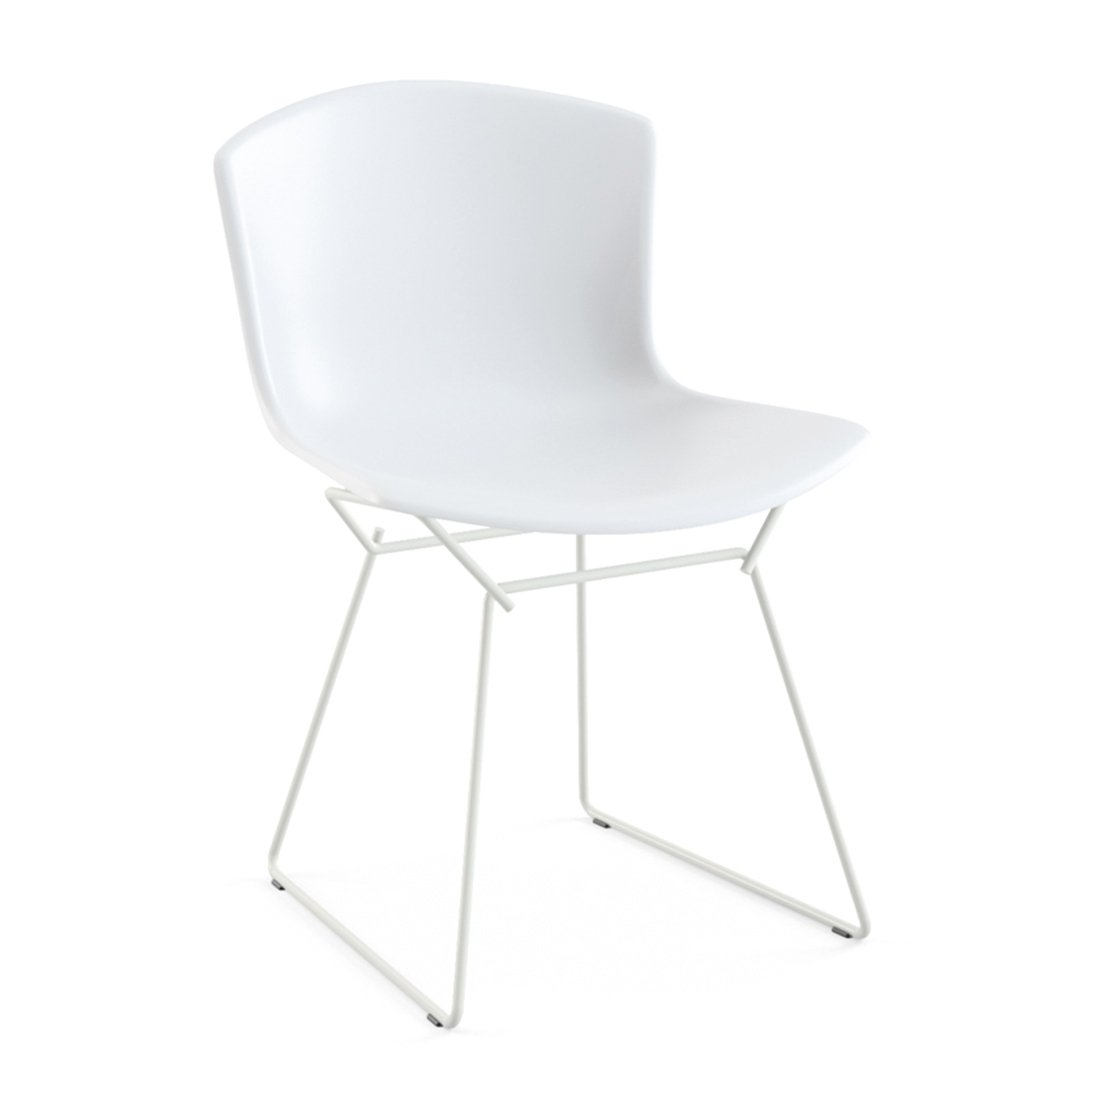 Knoll Bertoia Plastic Side Chair - Wit/Wit